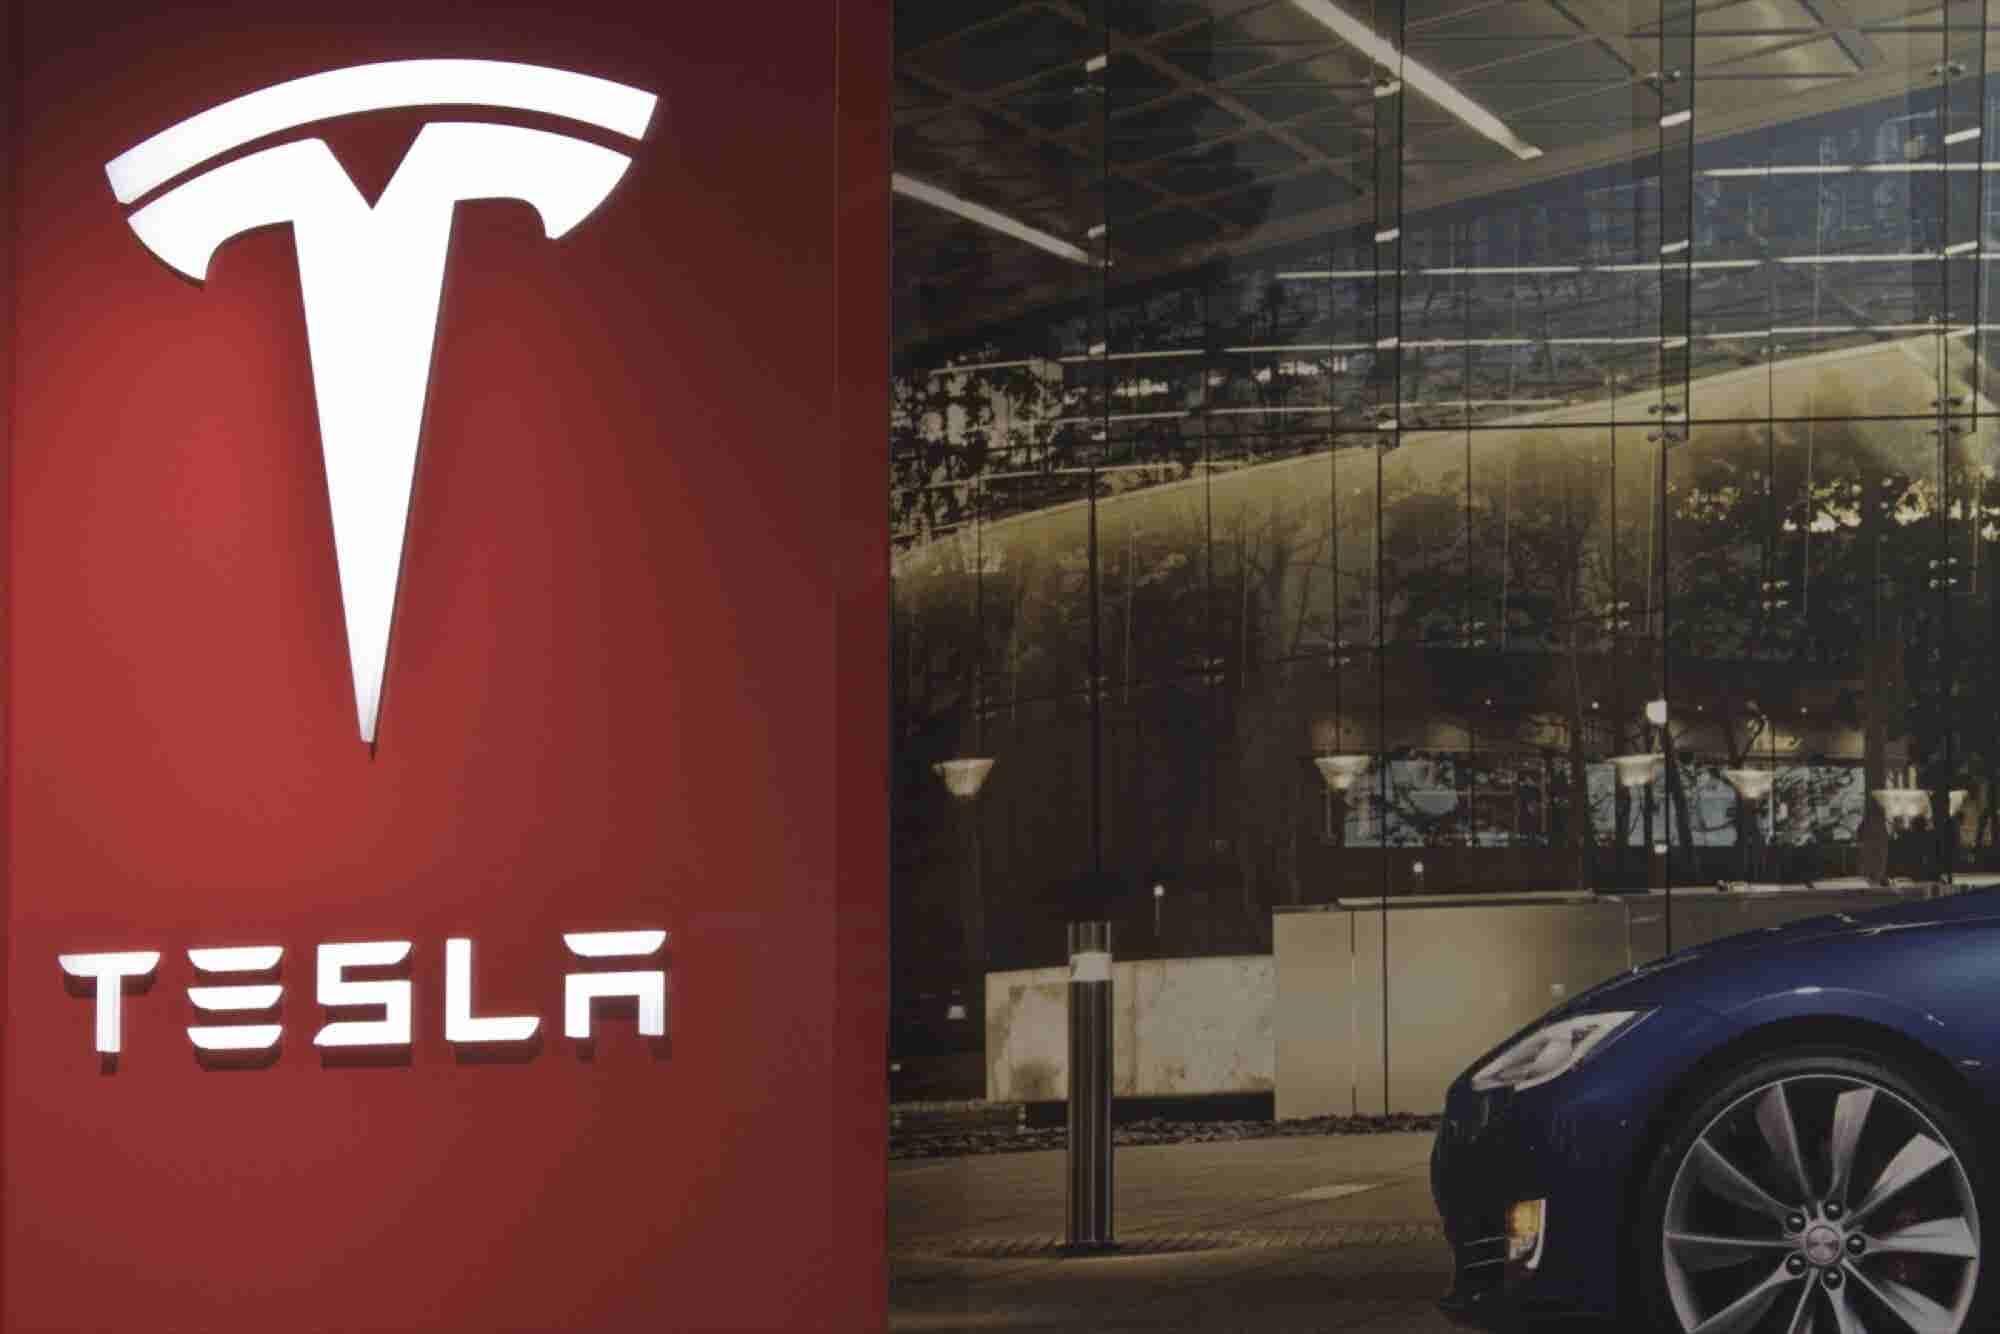 Musk's New Successor and Tesla's New Trailblazer